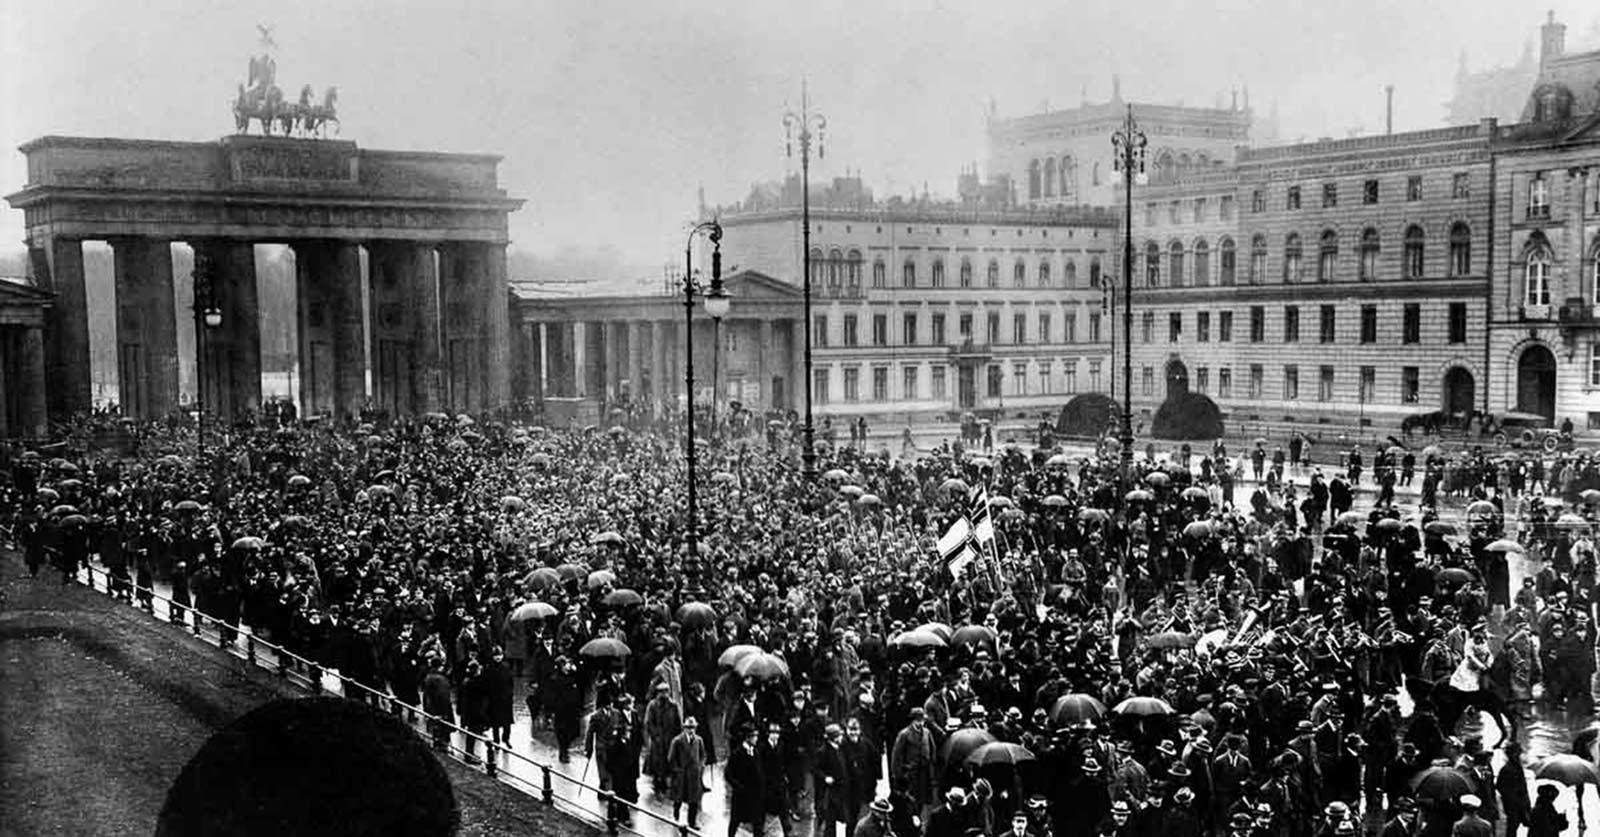 traum-der-hundert-stunden:-der-kapp-putsch-1920compact+